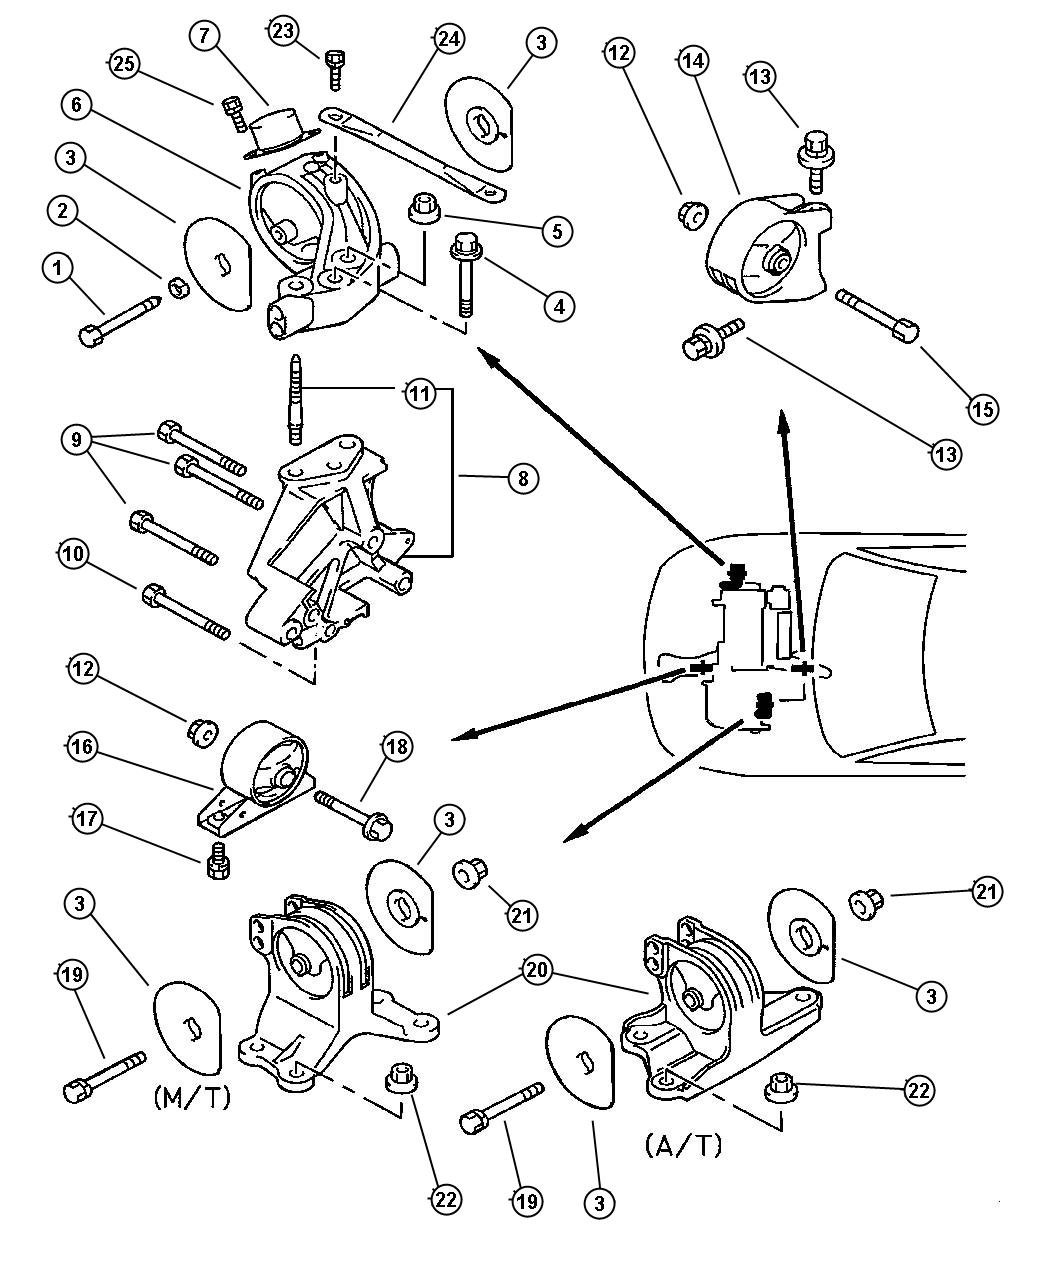 Dodge Stratus Nut. Hex flange. M12x1.75. Trans mounting